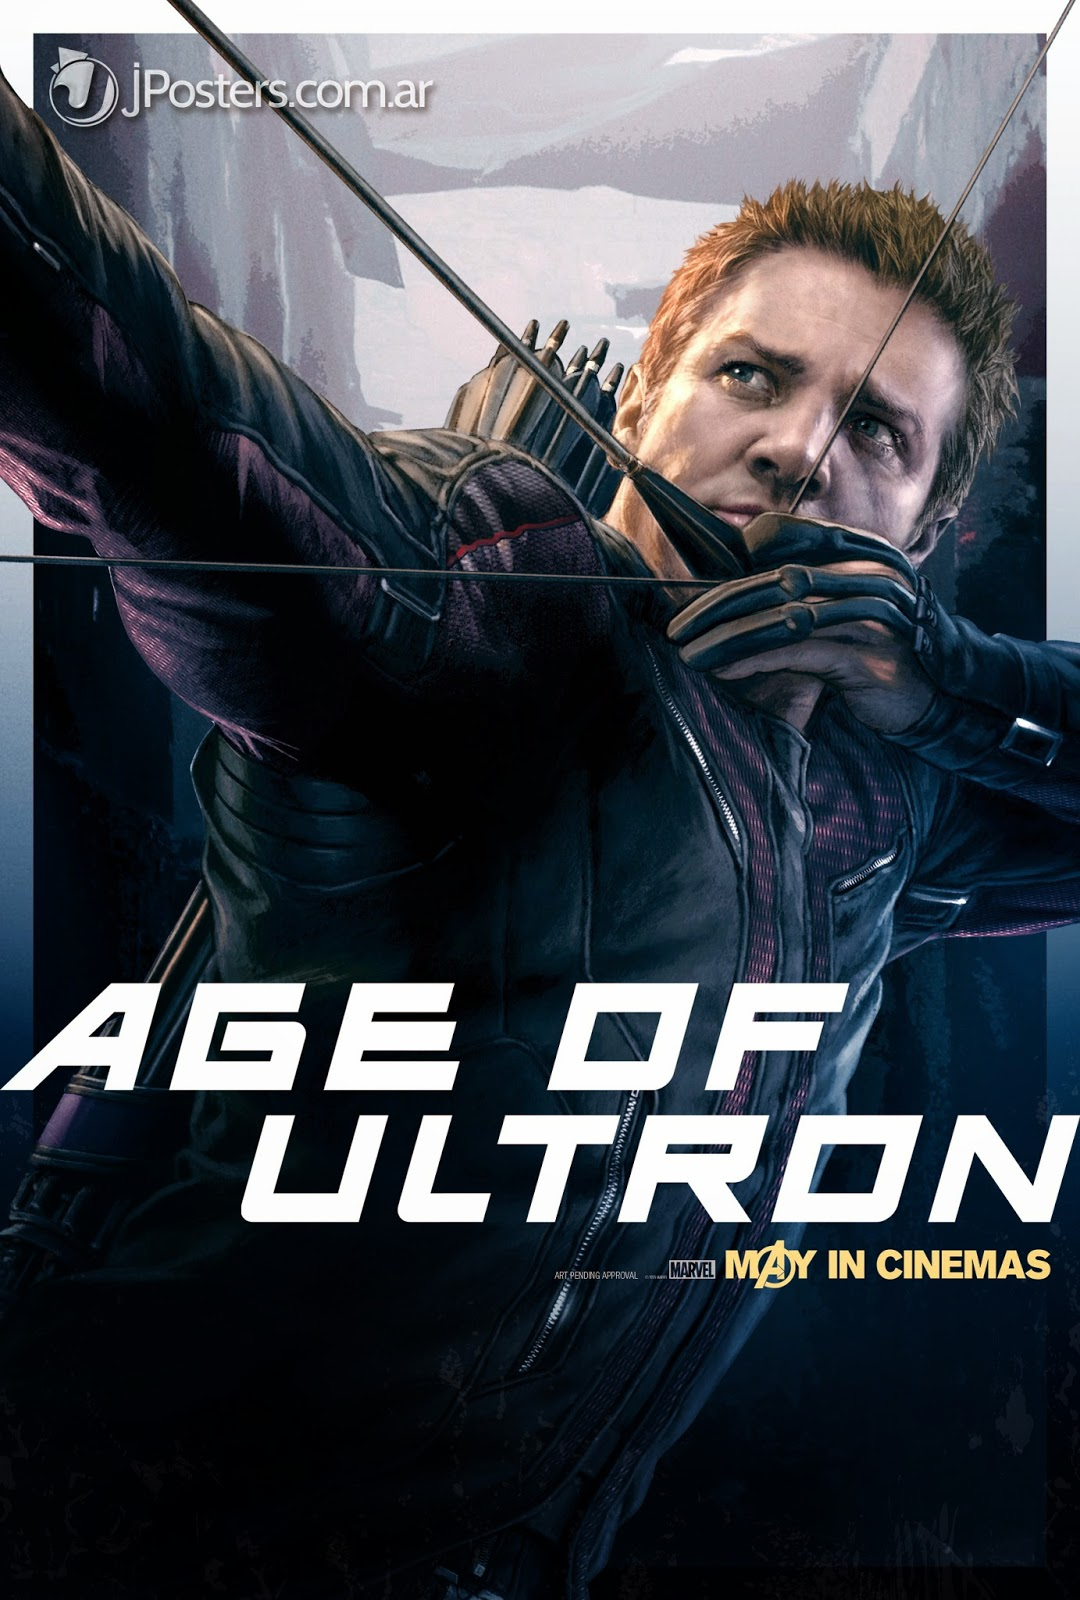 Avengers: Age of Ultron,